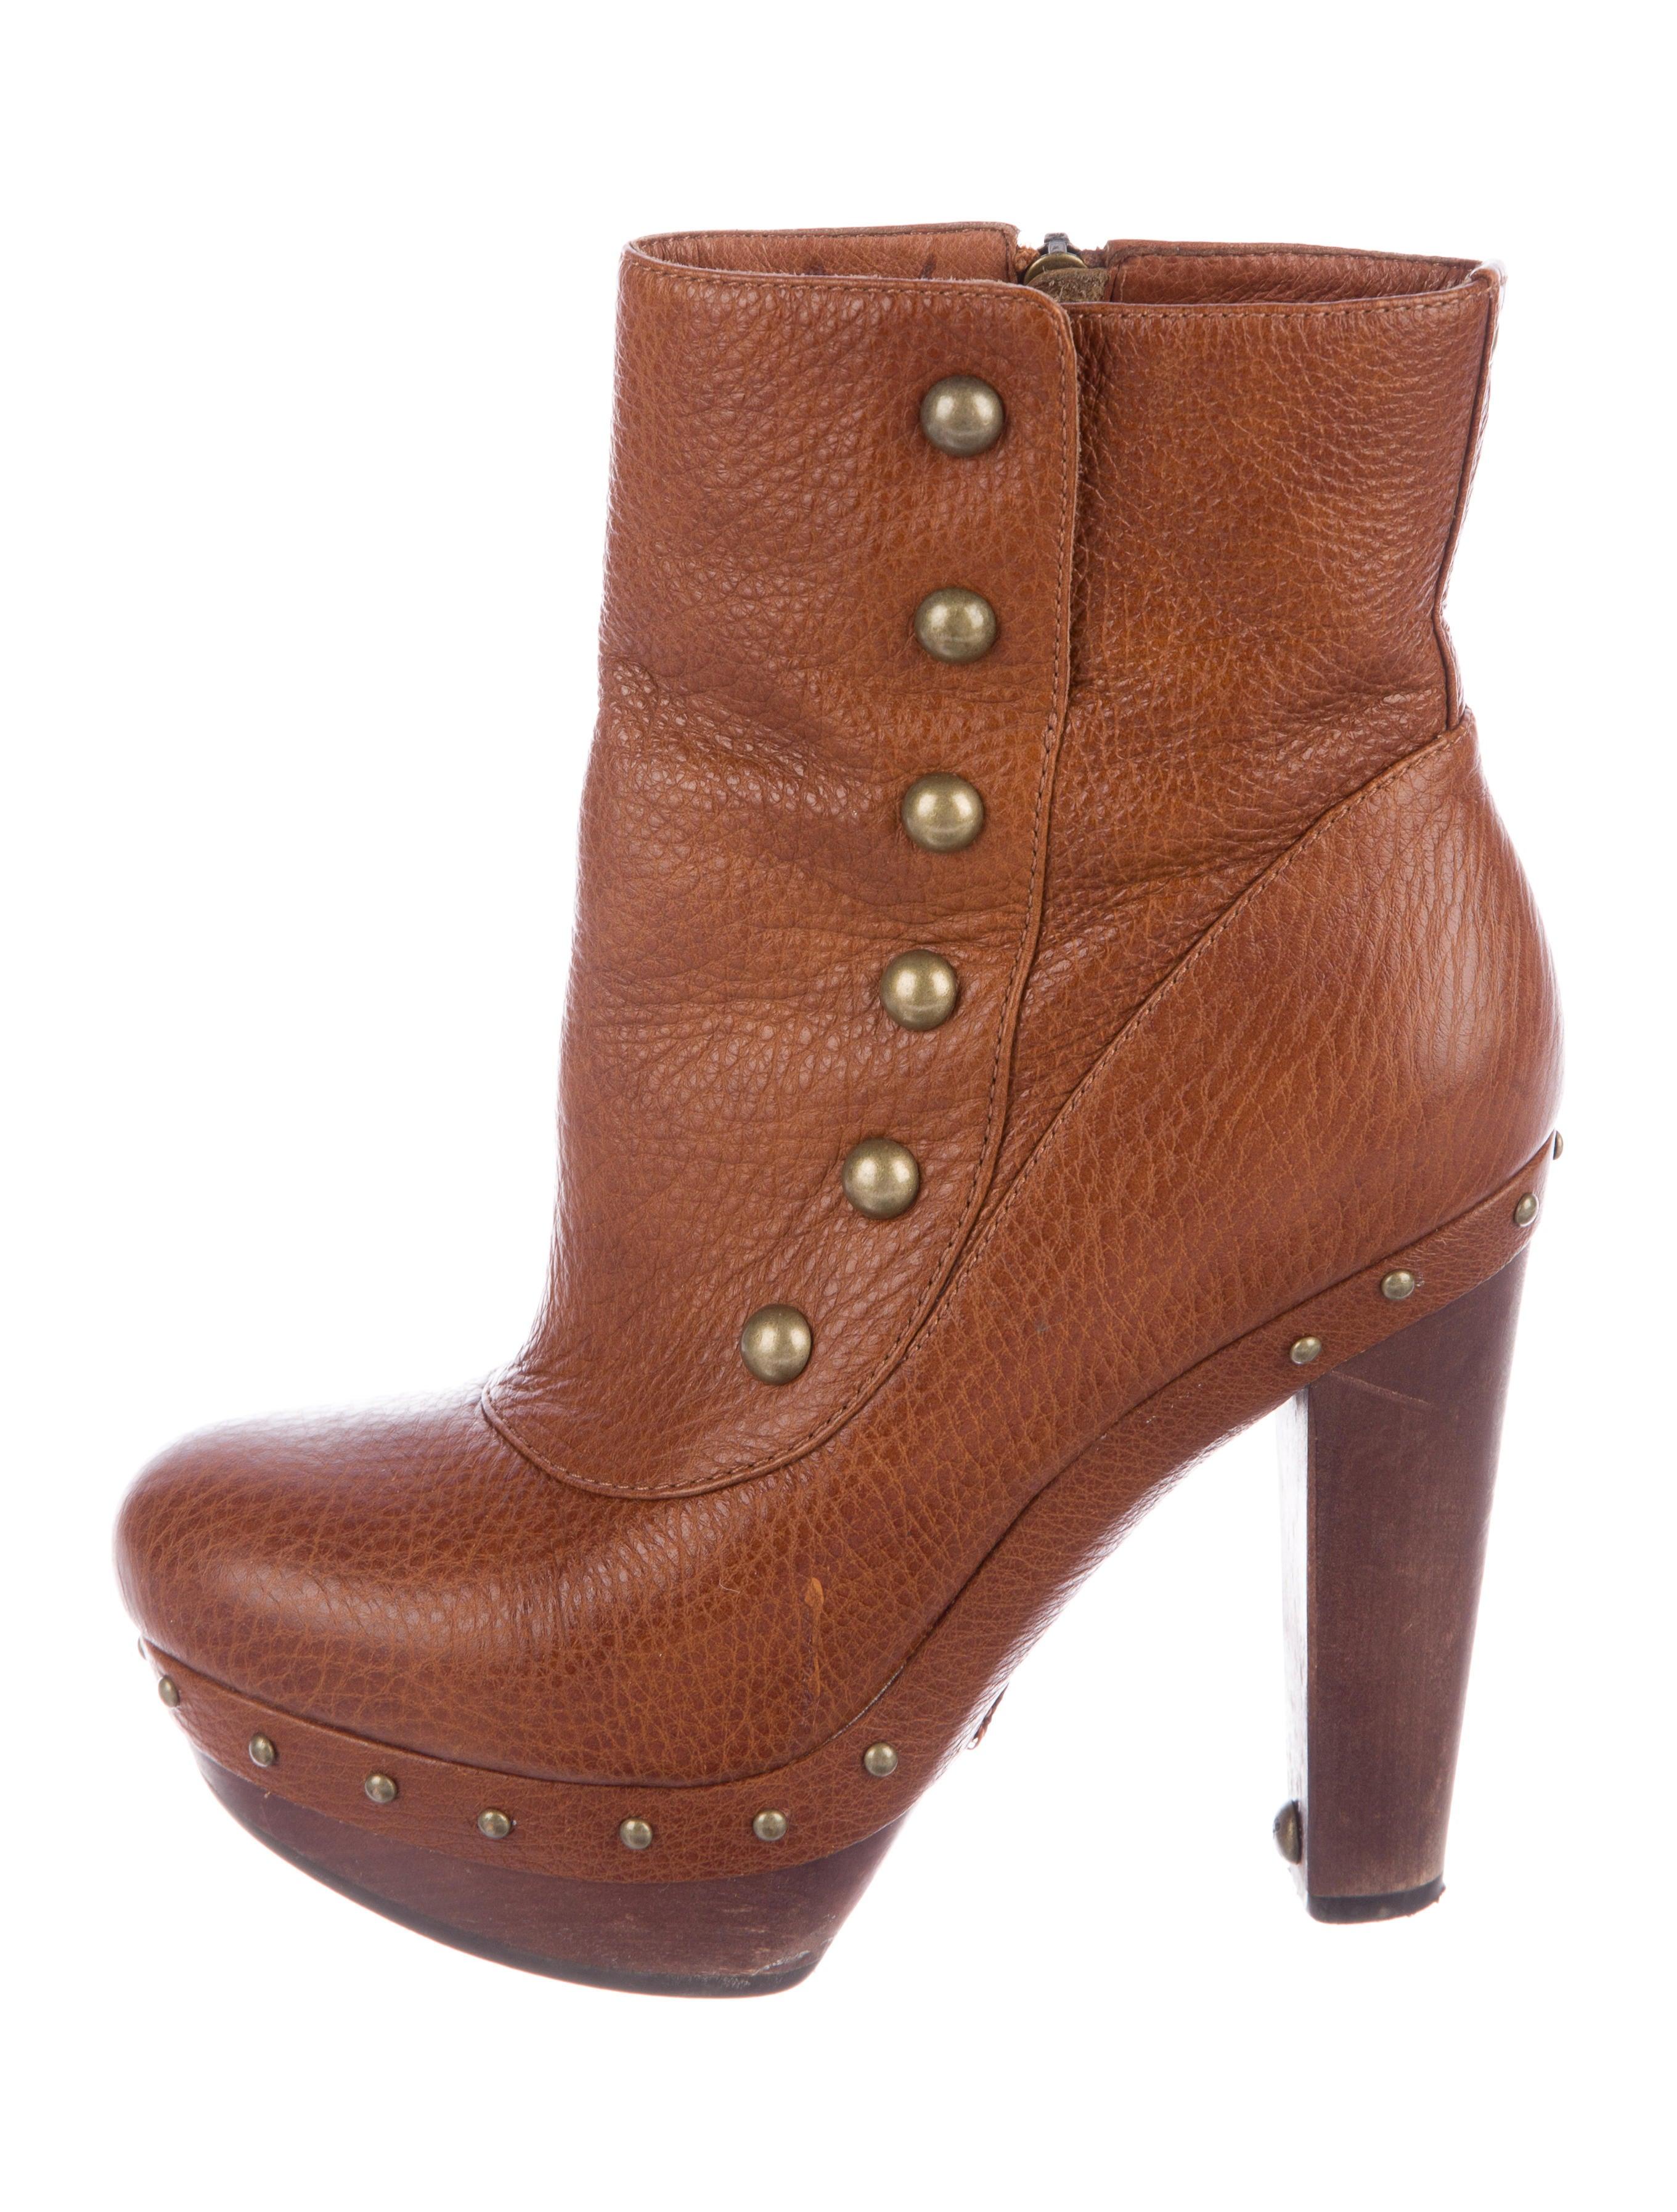 UGG Australia Leather Platform Ankle Boots cheap sale popular sale for nice discount footlocker 7AKR4ru9i